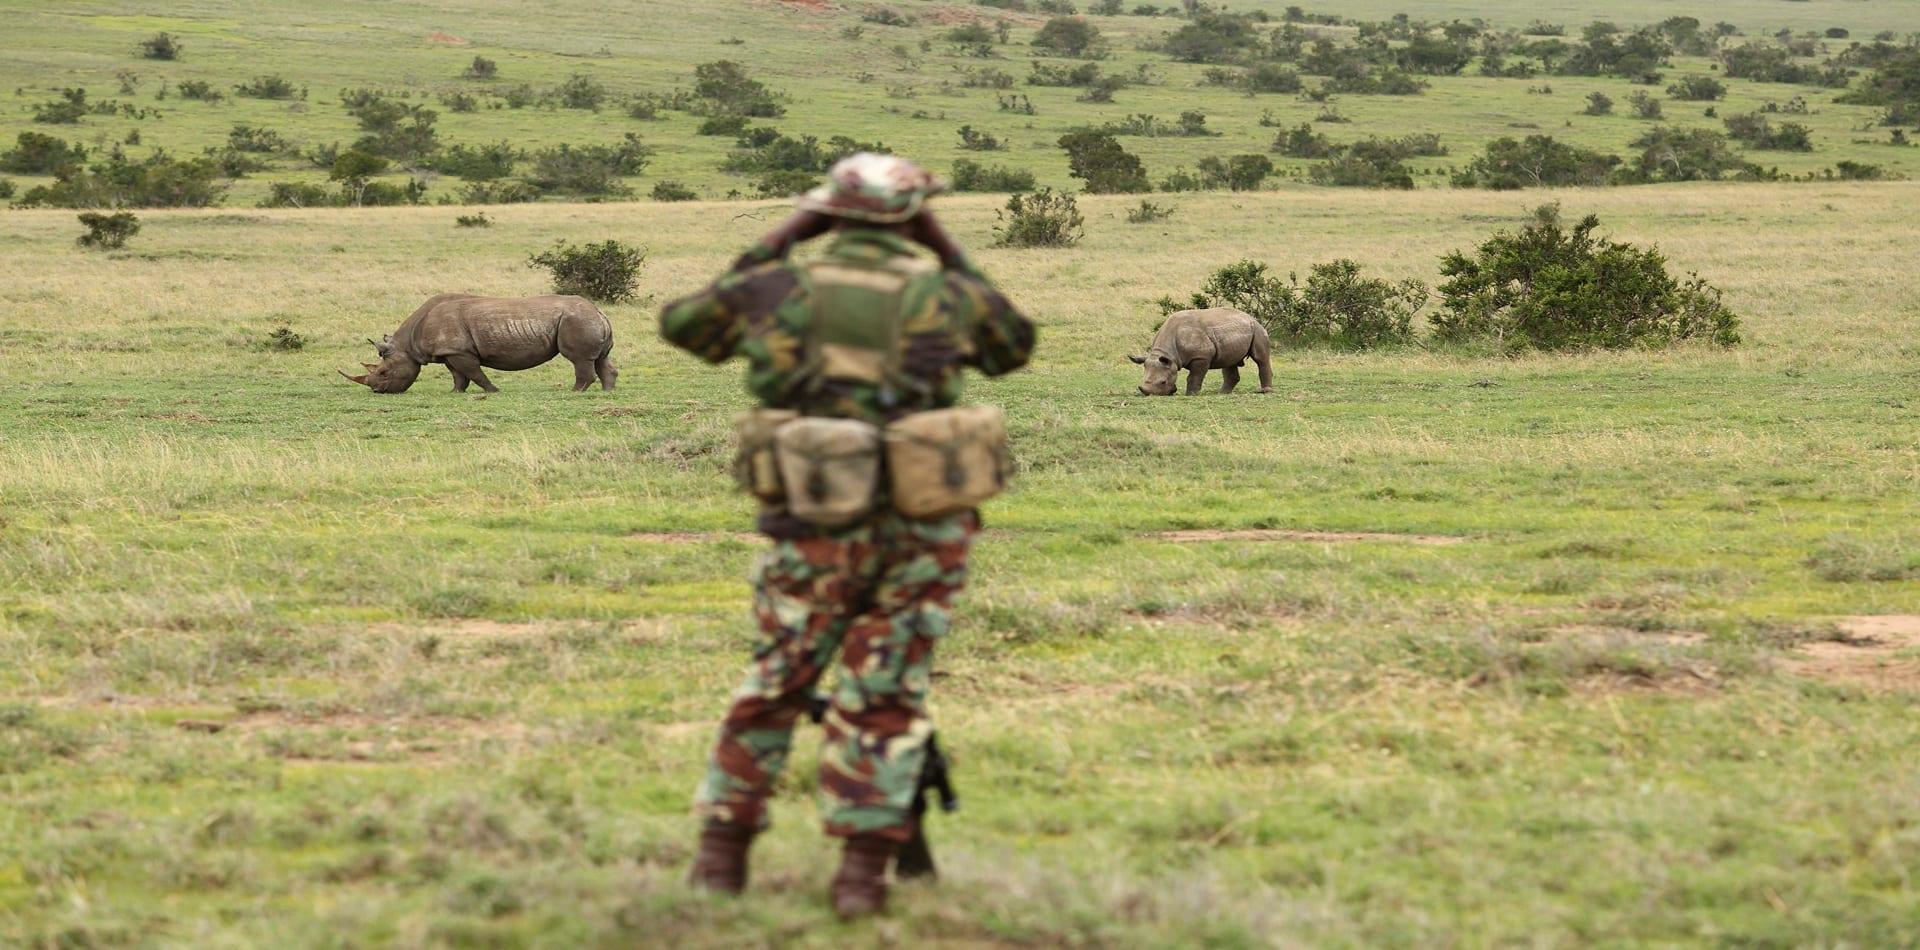 field ranger rhino conservation kenya